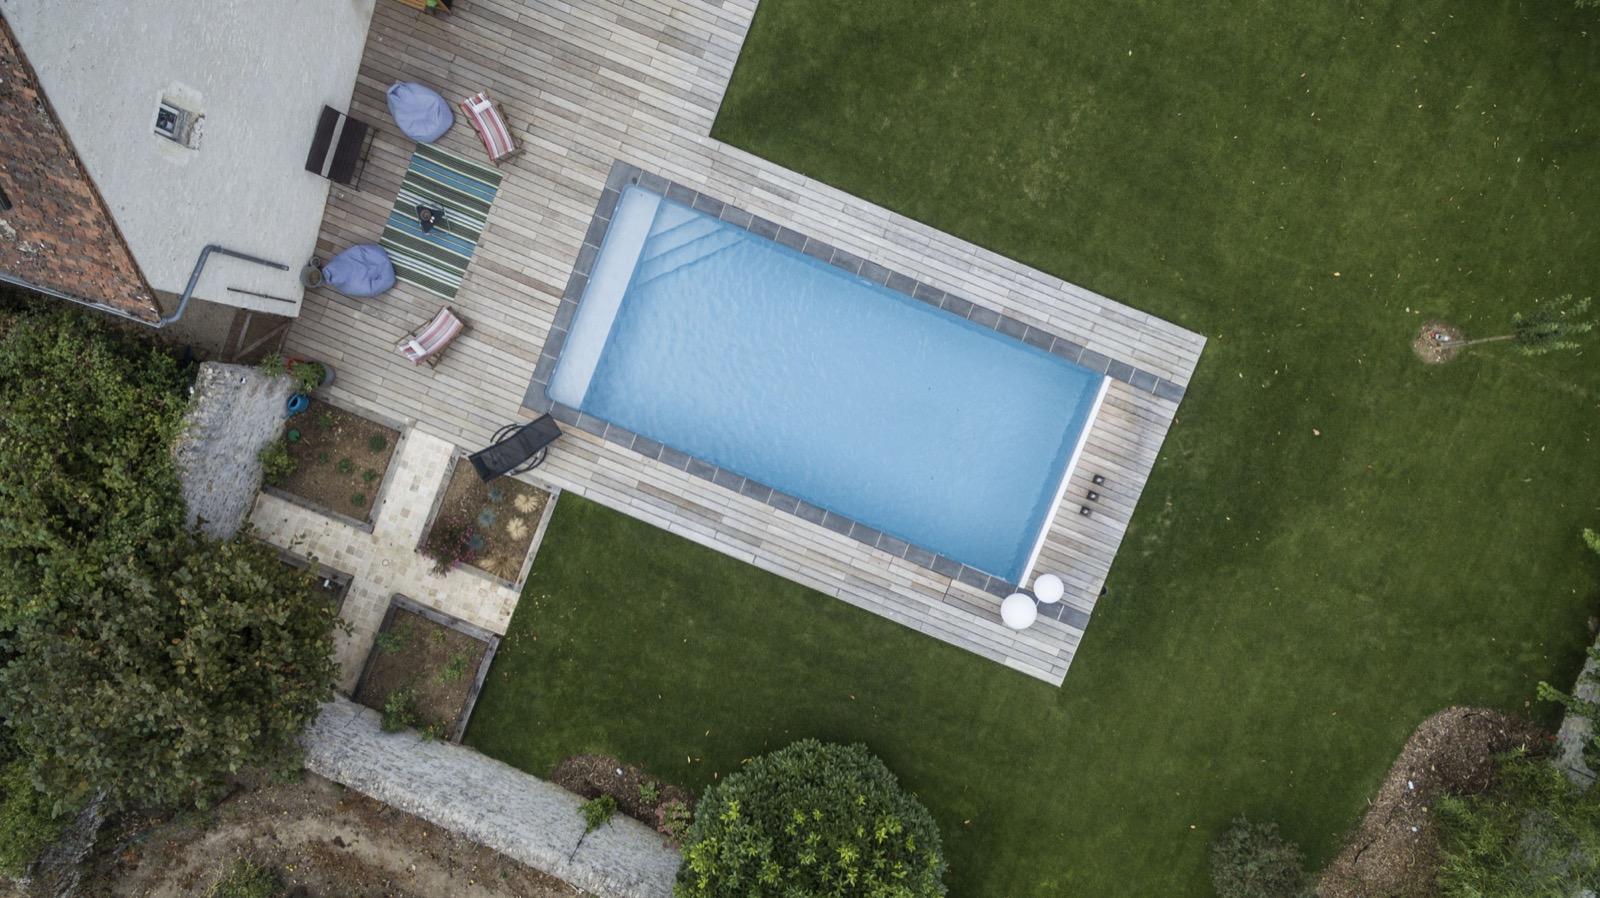 Piscines rectangle vue drone